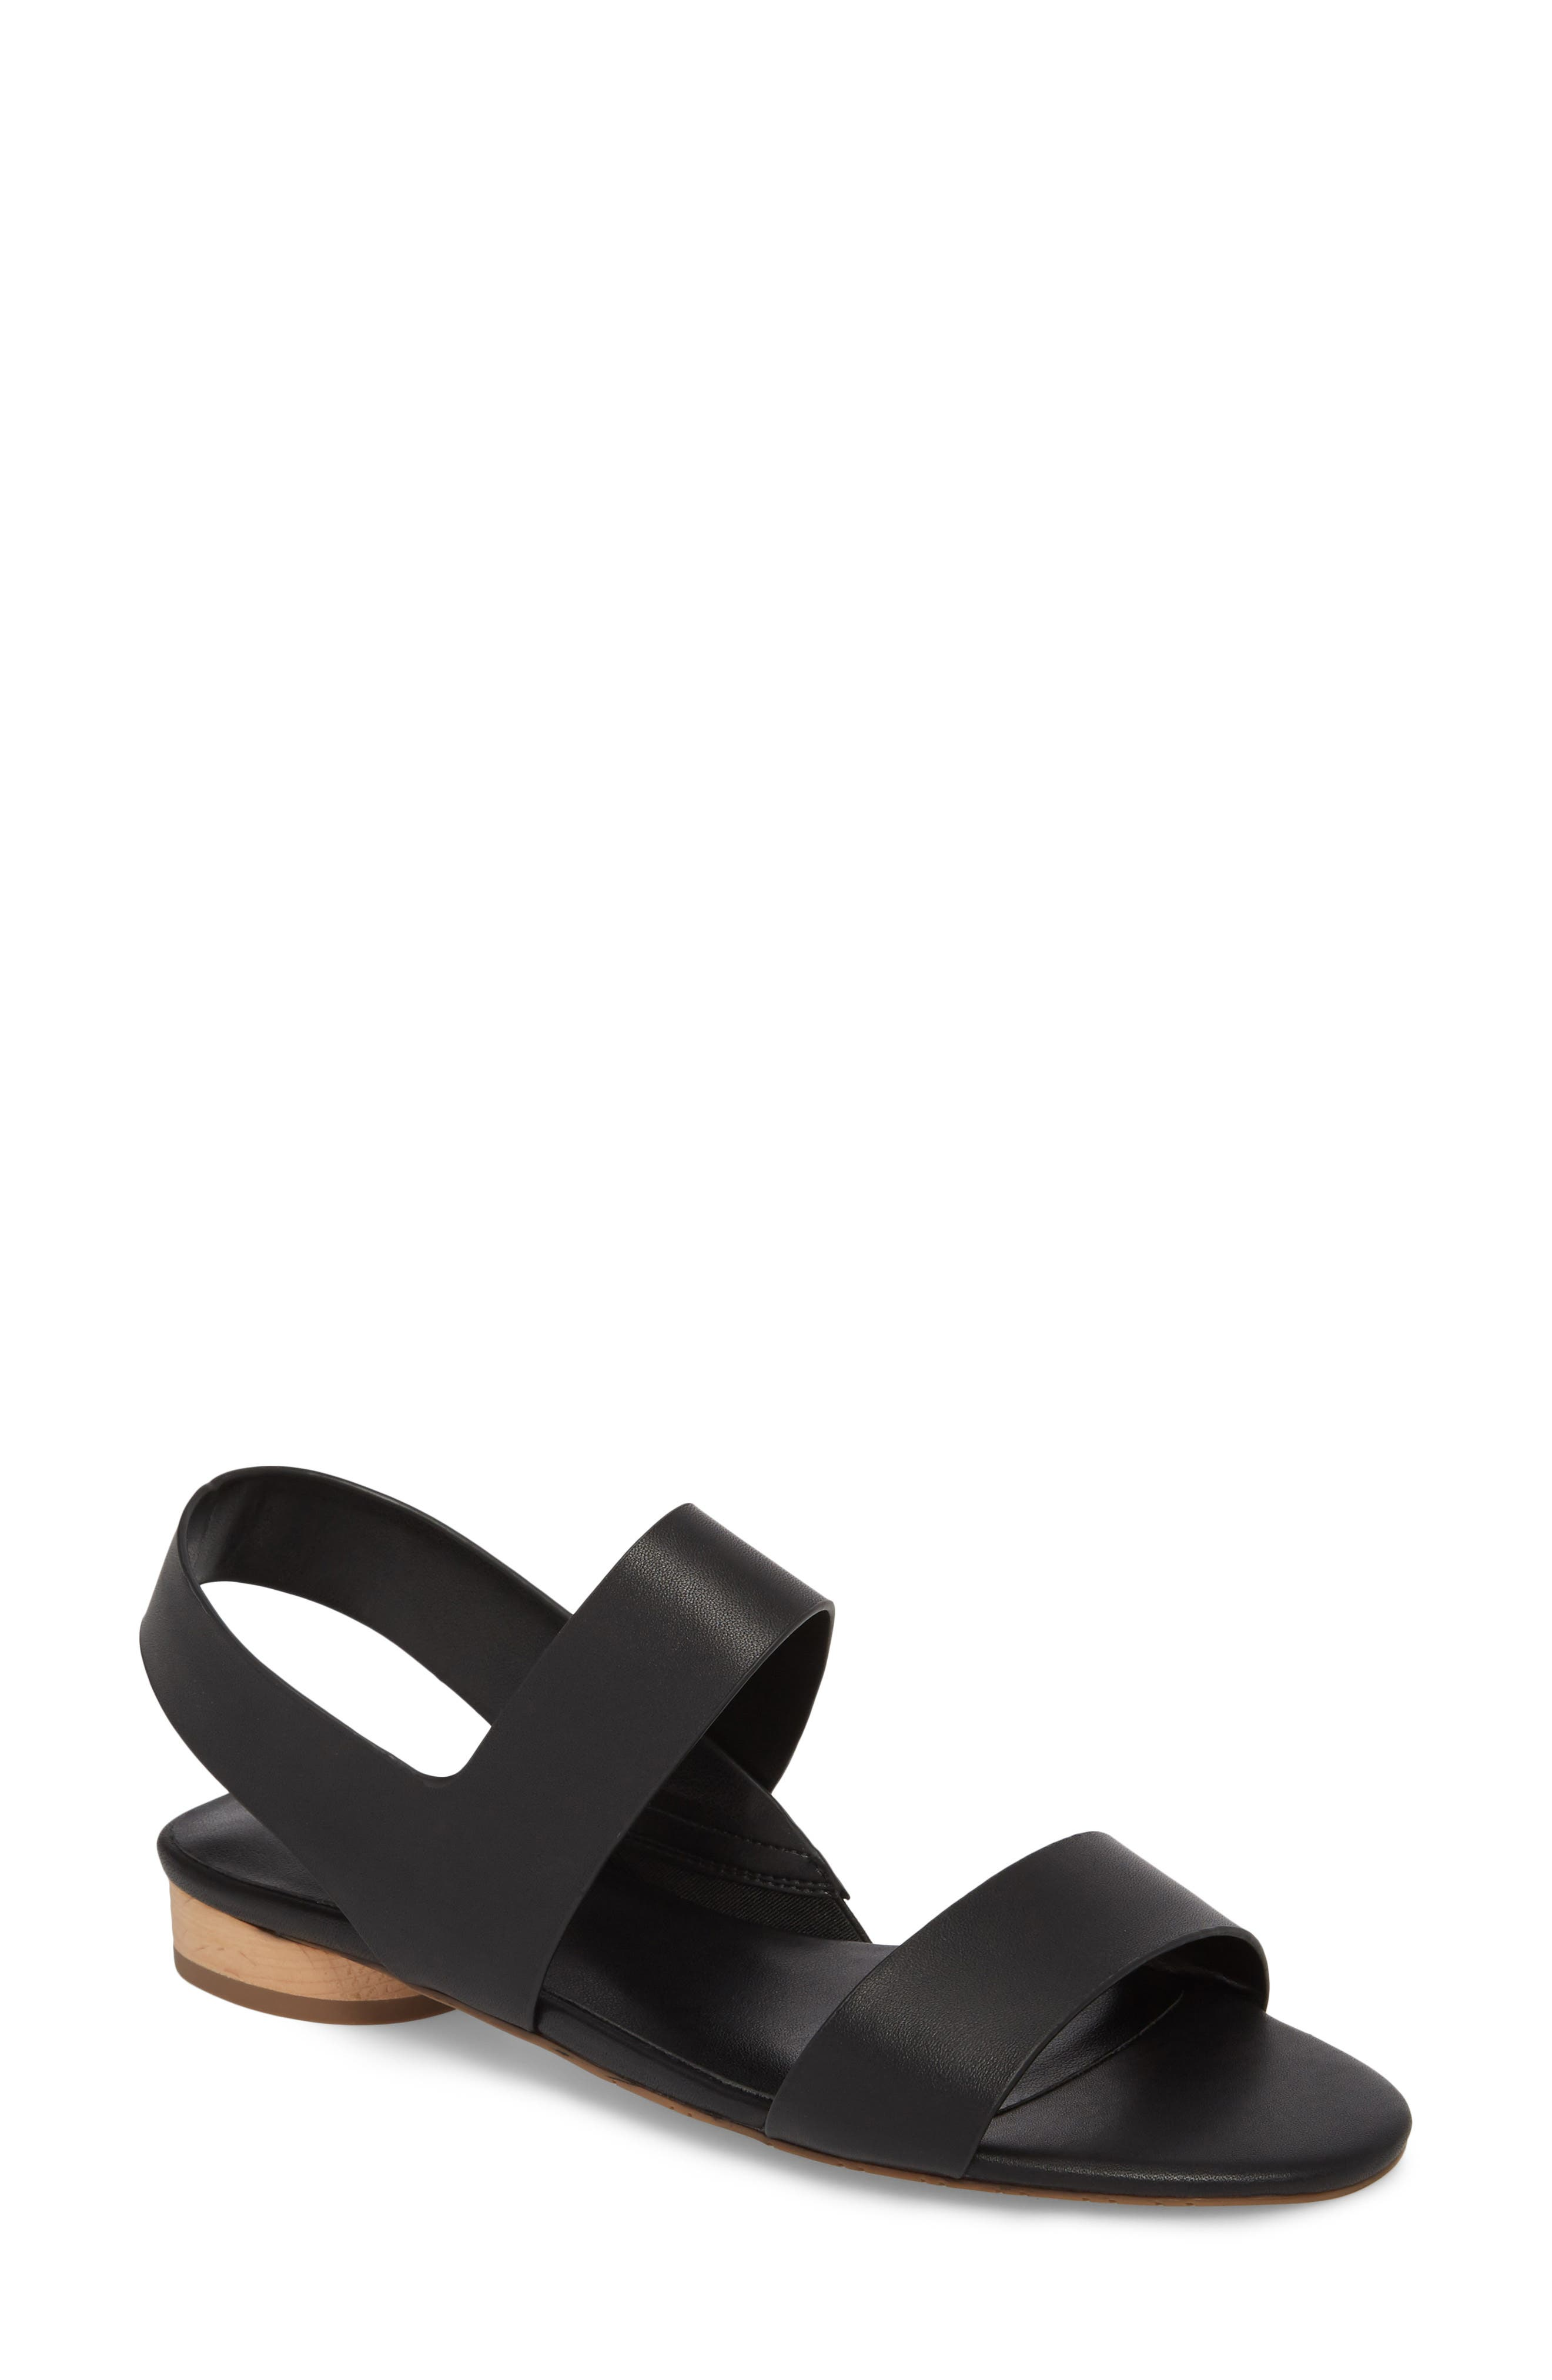 Blanka Sandal,                         Main,                         color, BLACK LEATHER